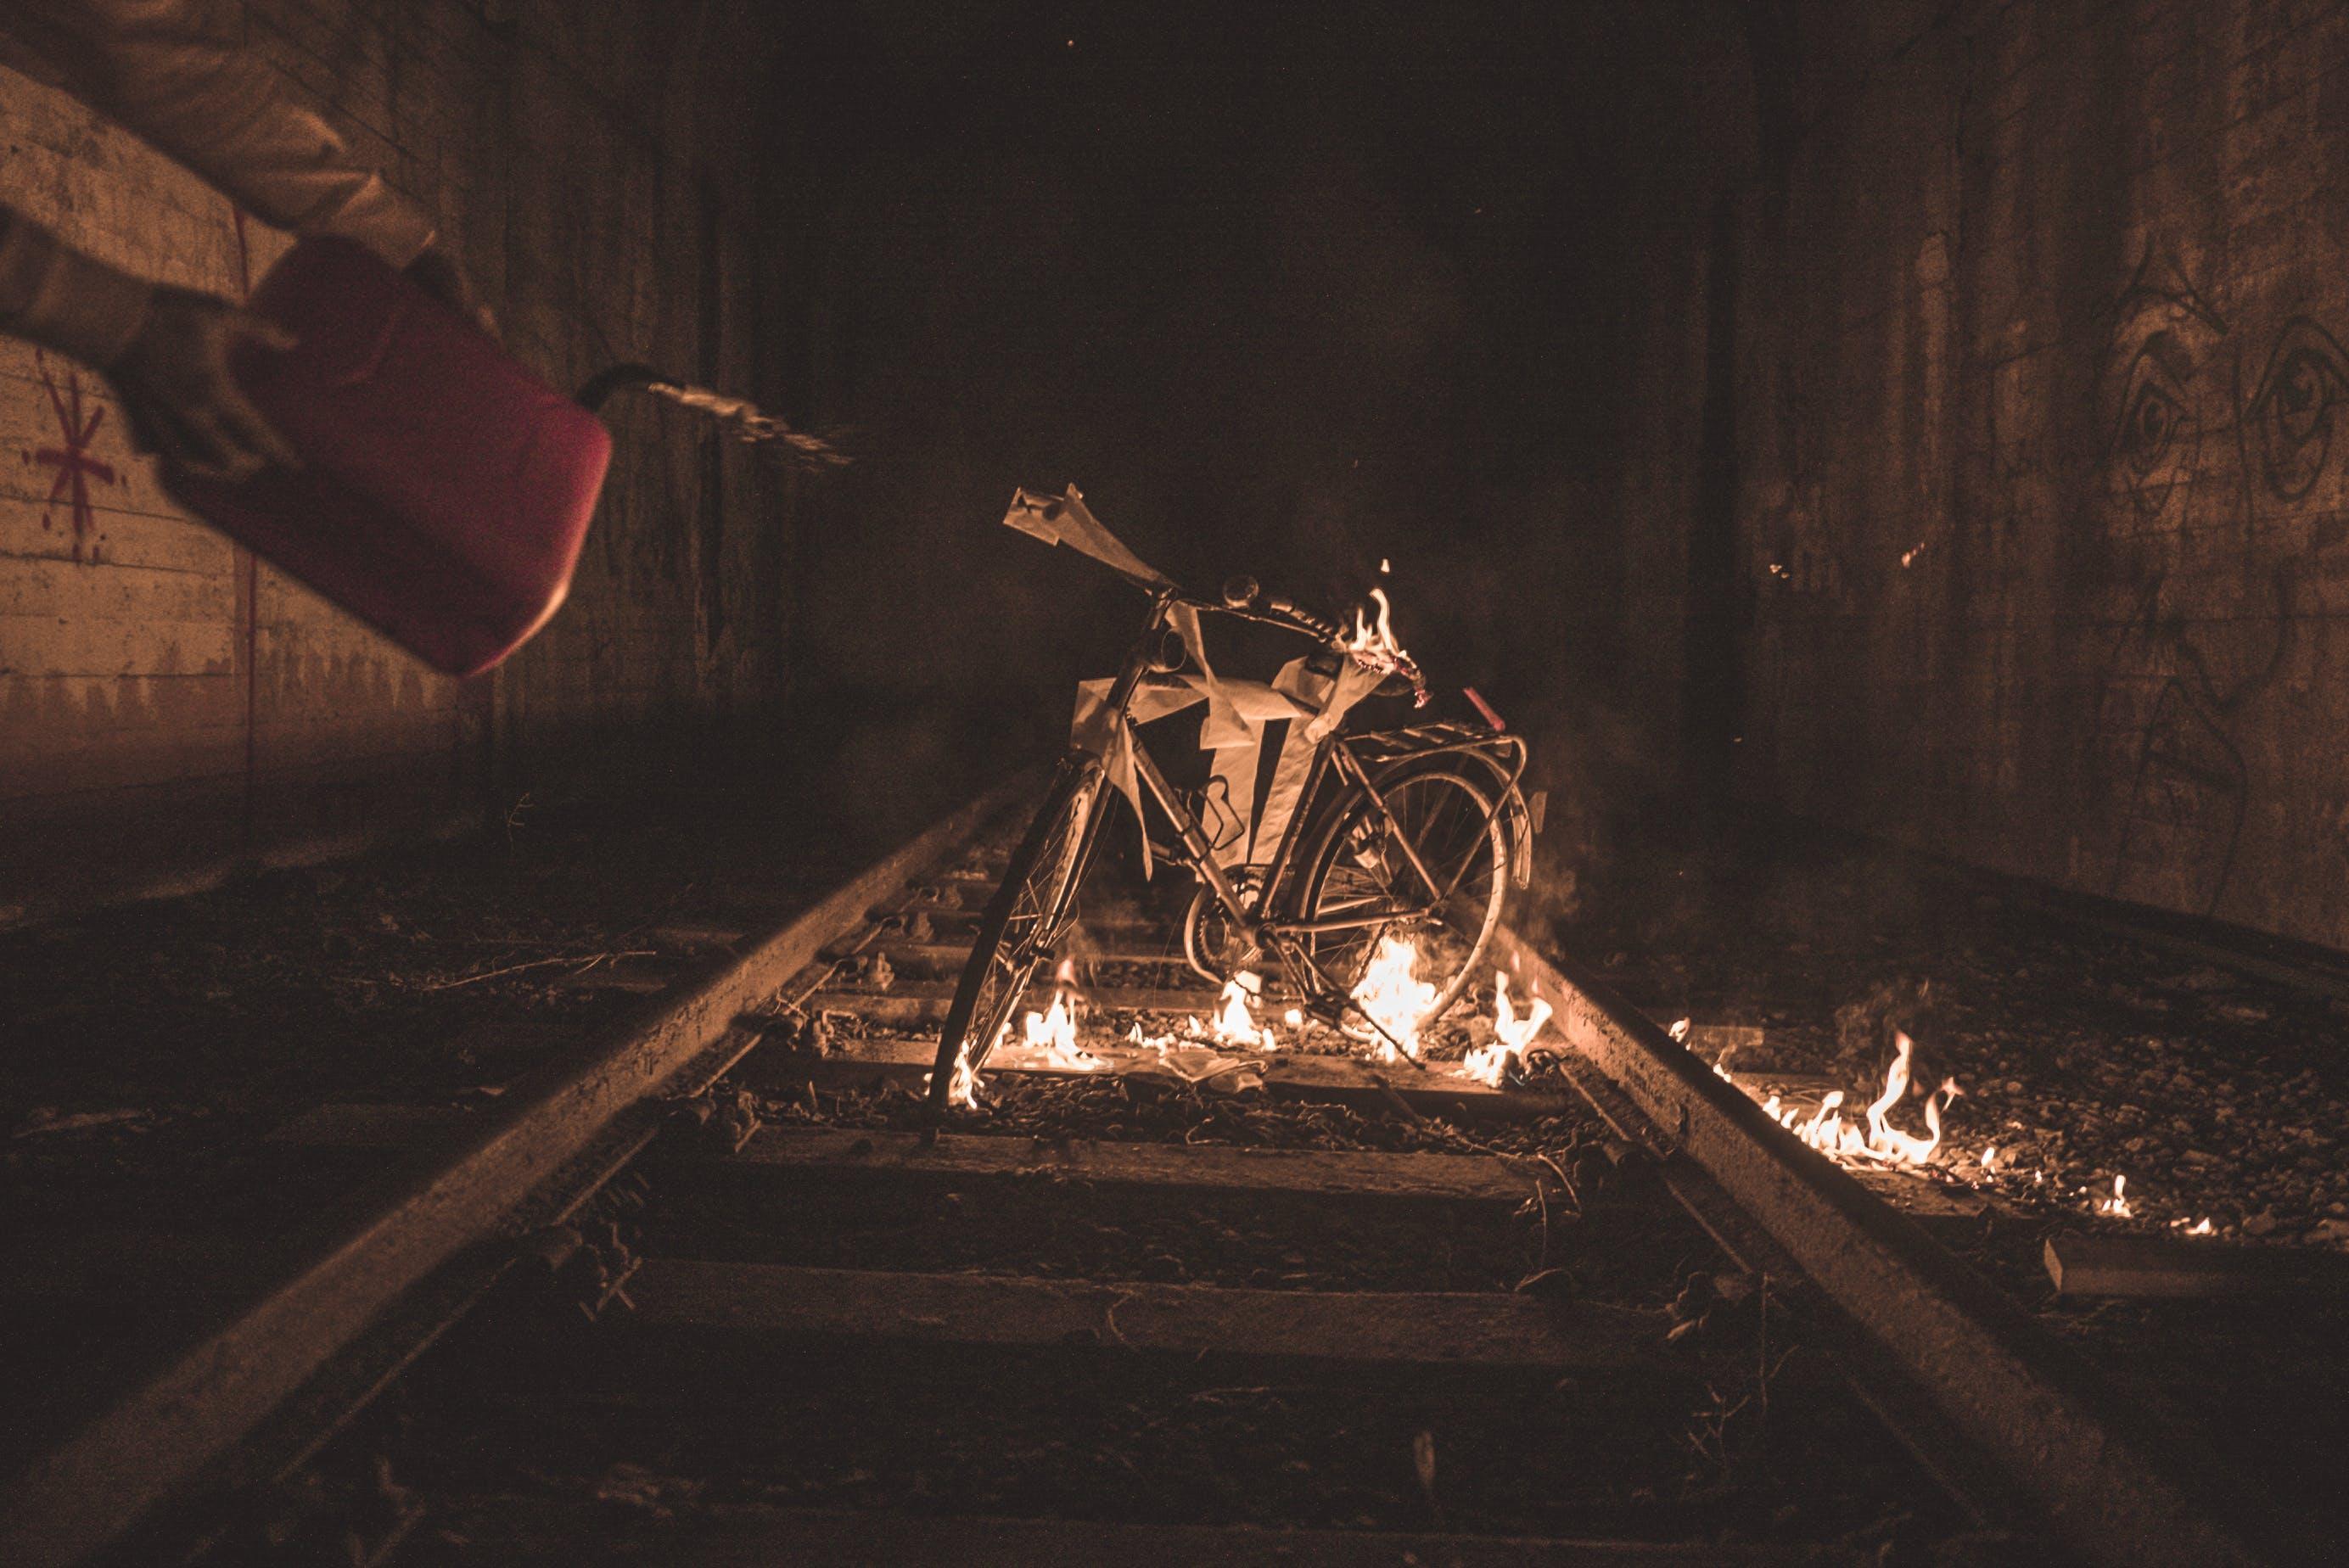 Bicycle on Flame on Train Railway